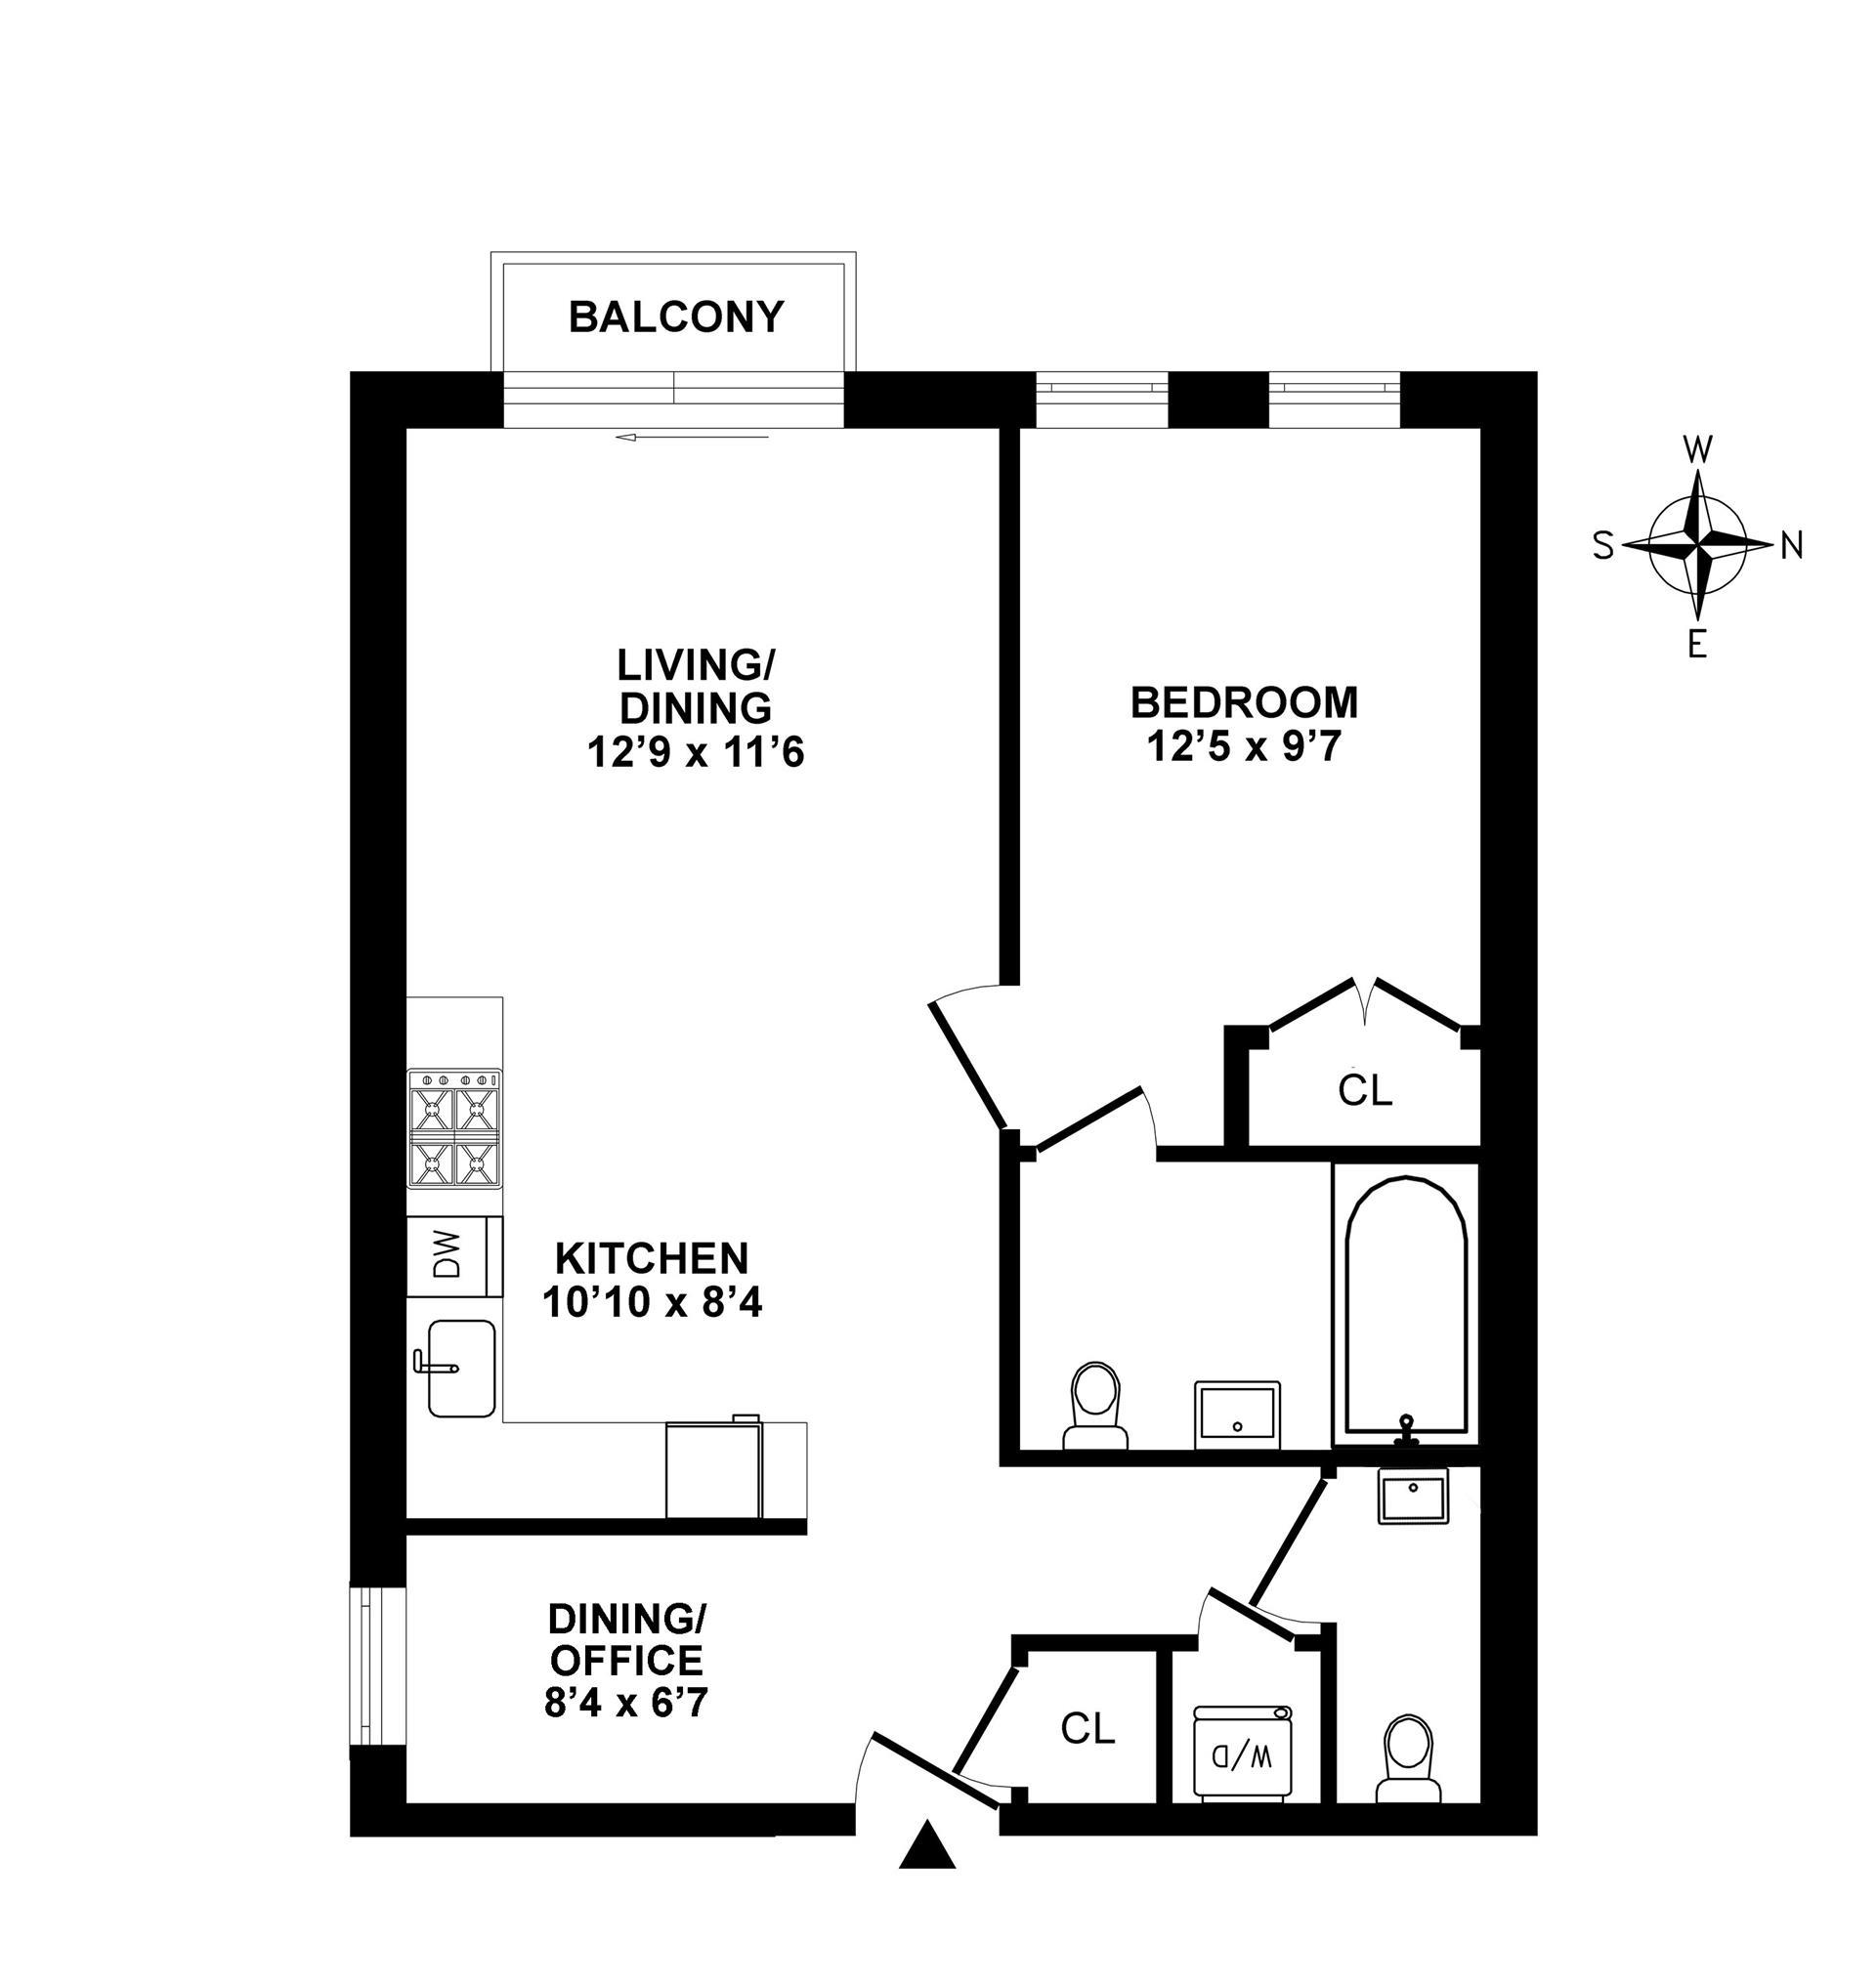 Floor plan of 64 Stanhope Street, 3A - Bushwick, New York